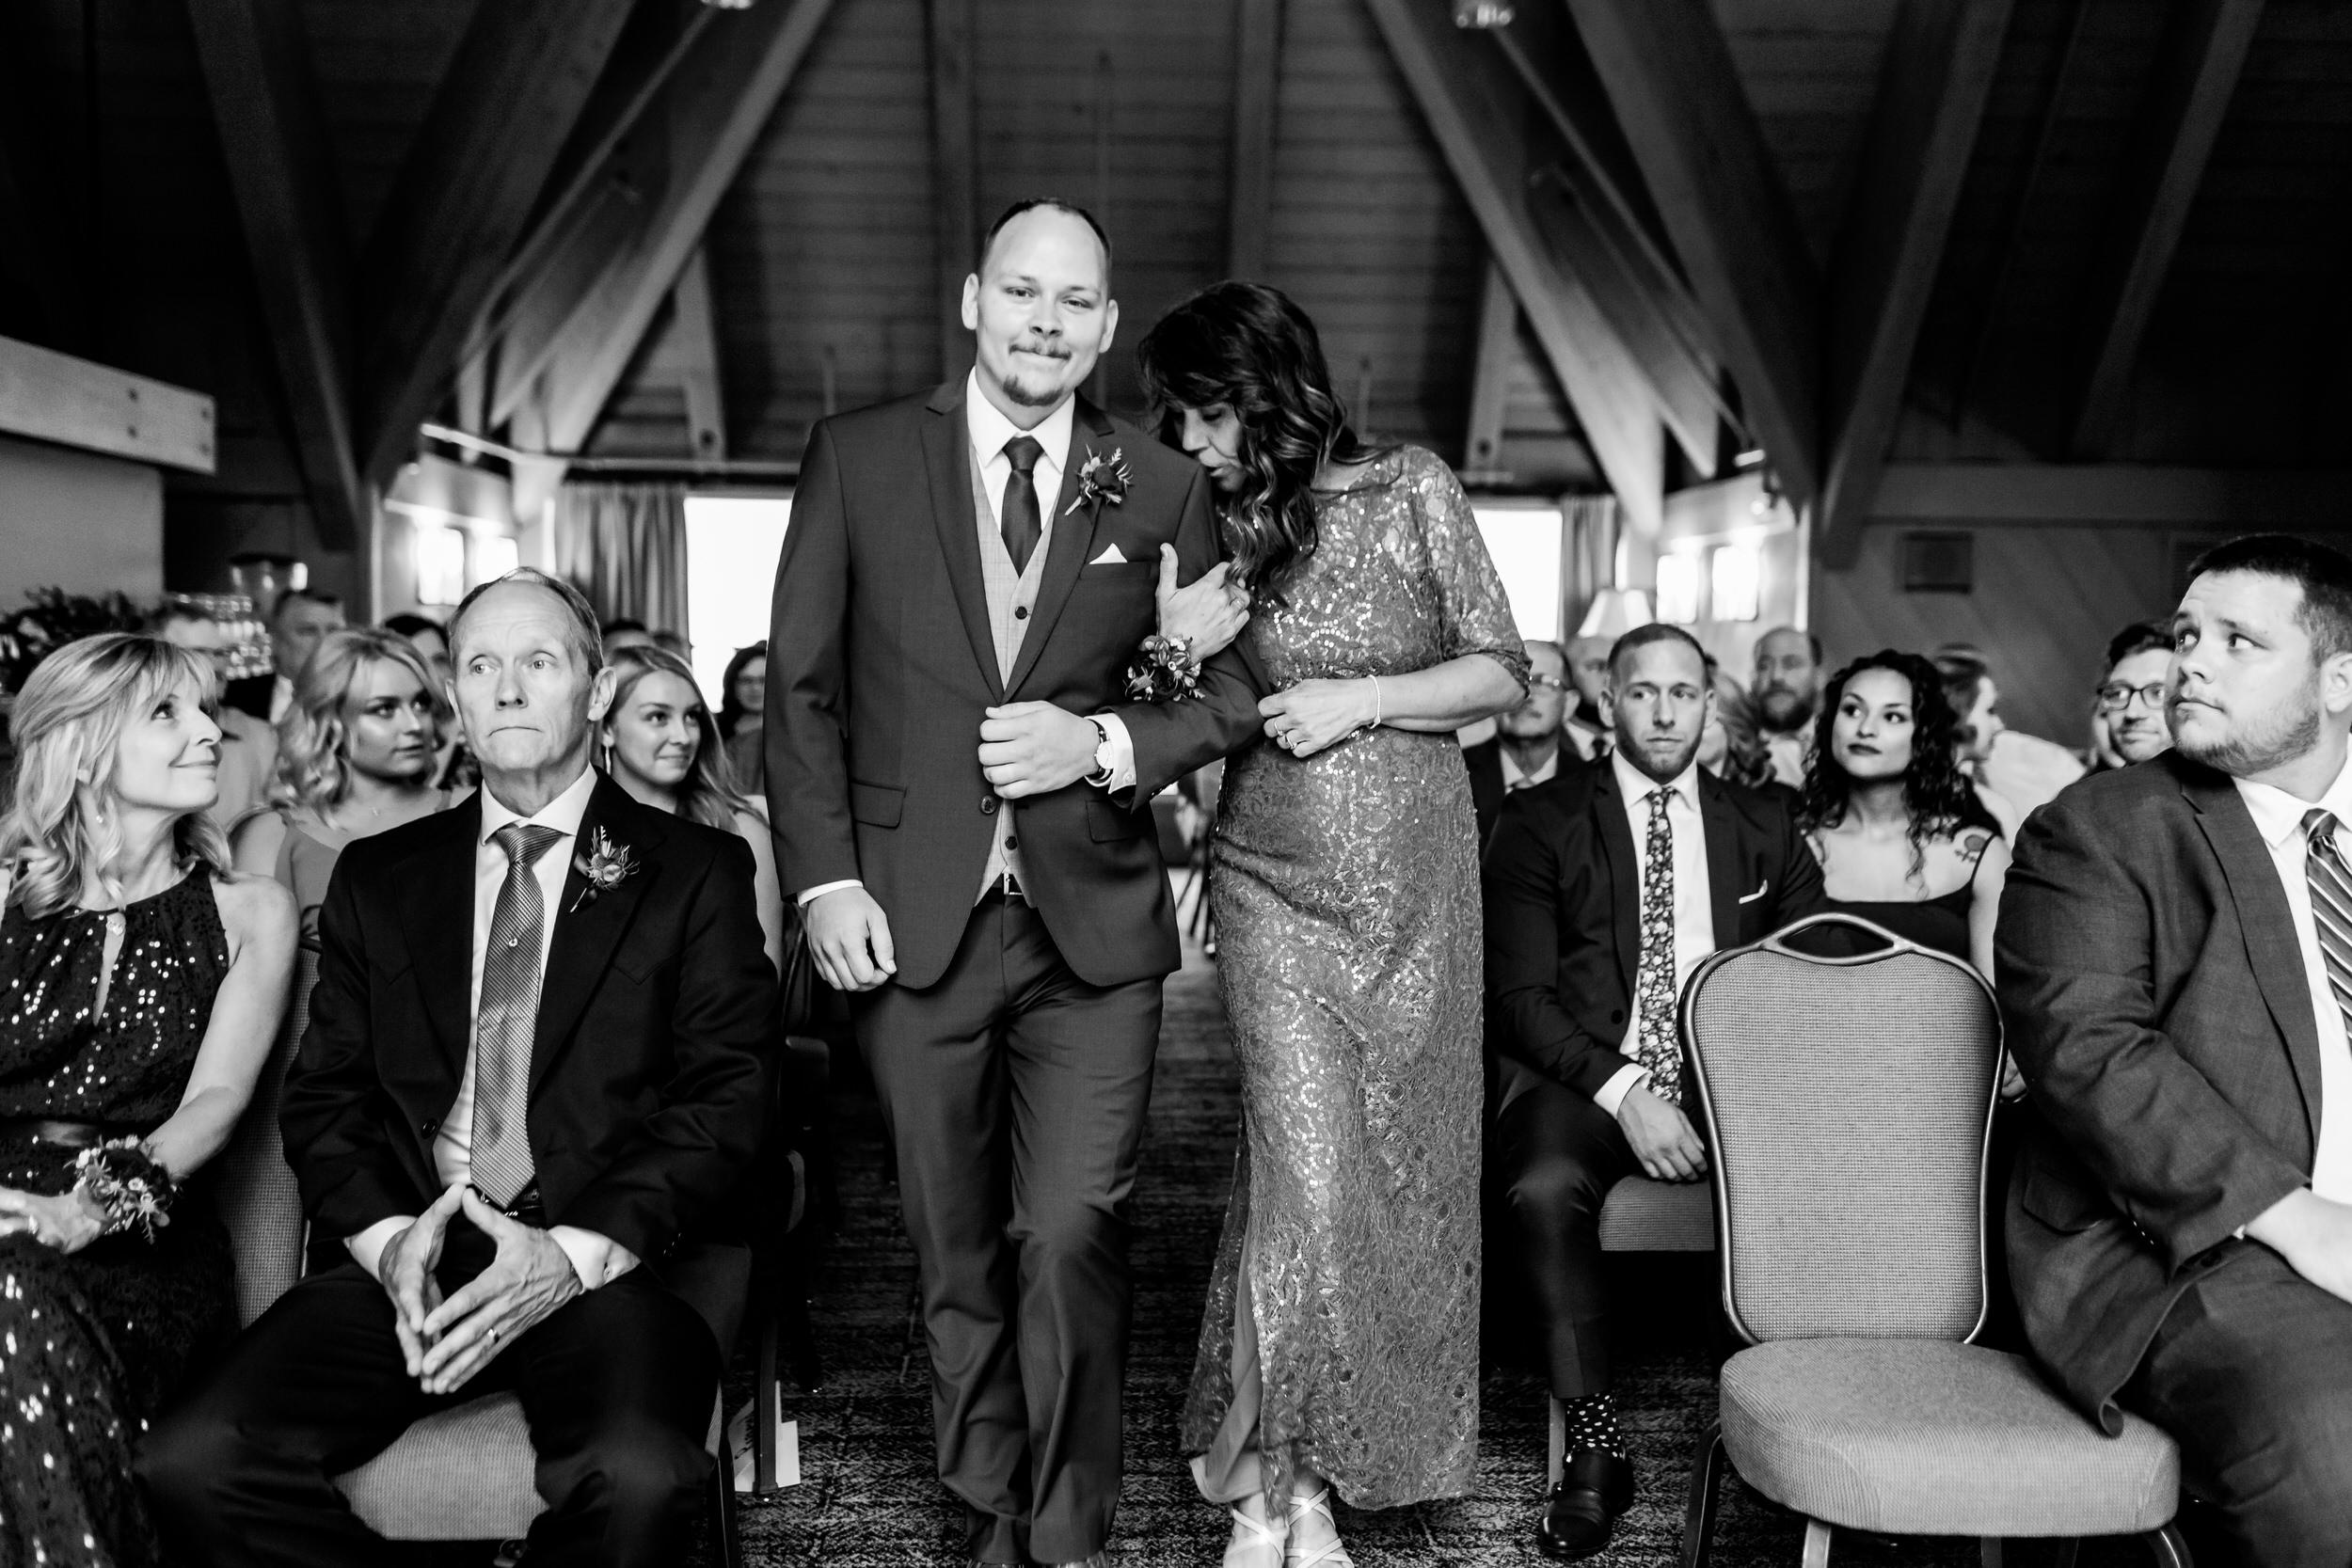 timberline_lodge_wedding_coltonjames_004